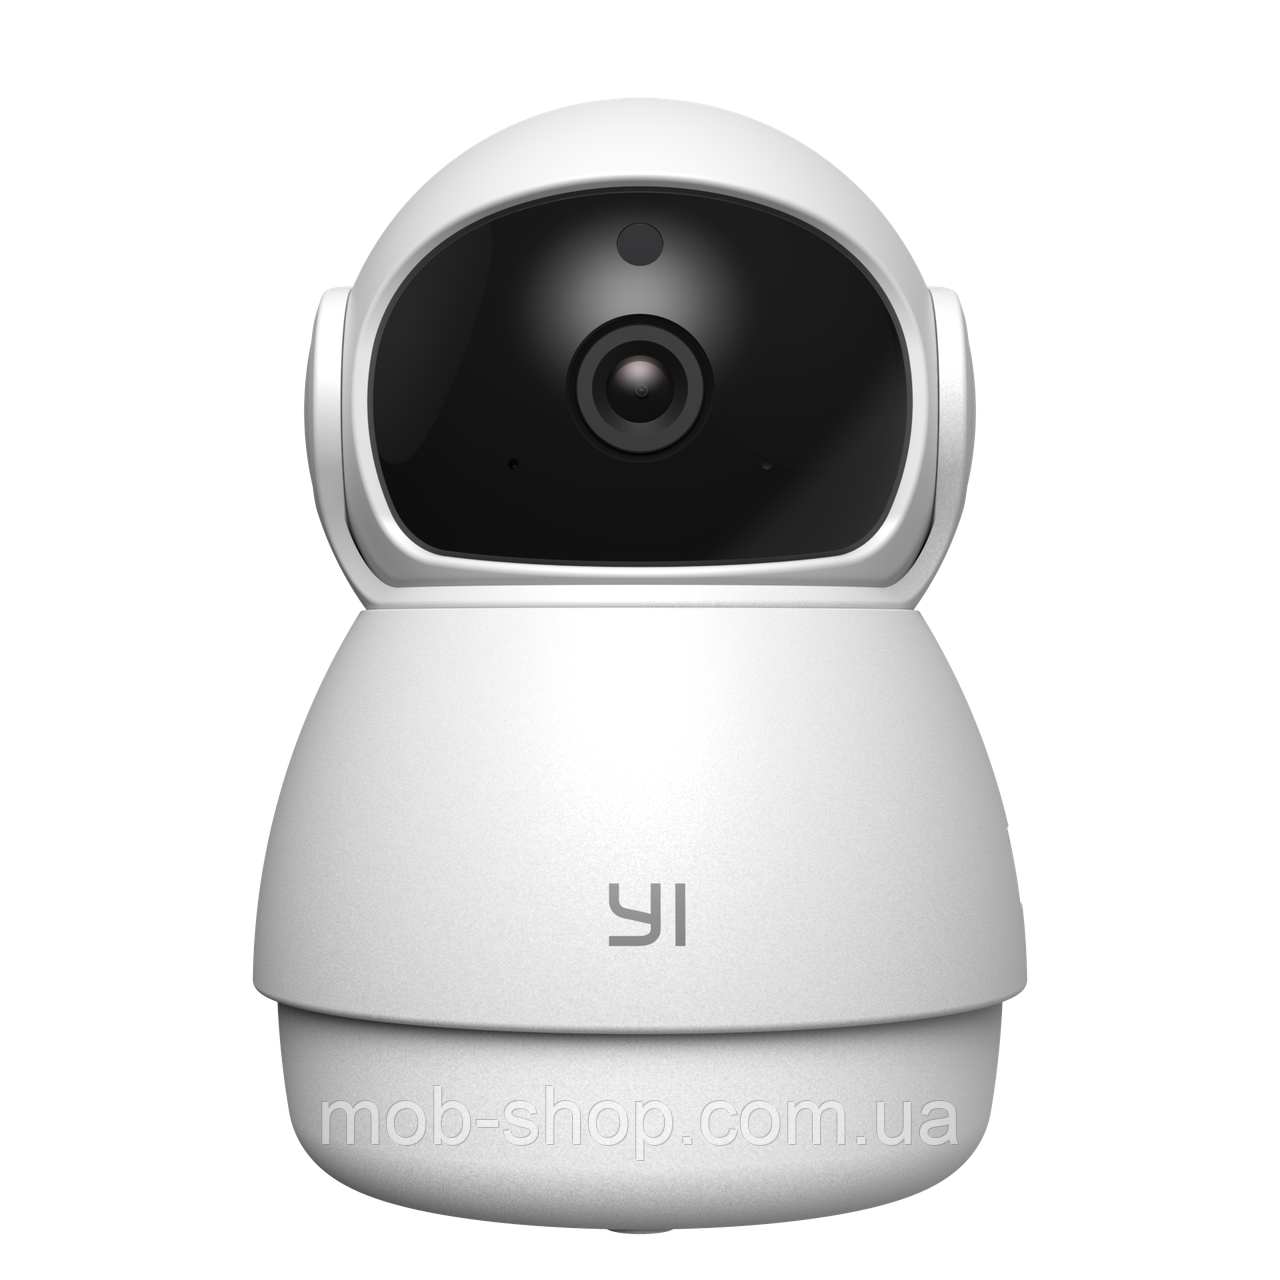 Видео камера IP Camera Xiaomi YI Dome Guard Camera 360° 1080p white